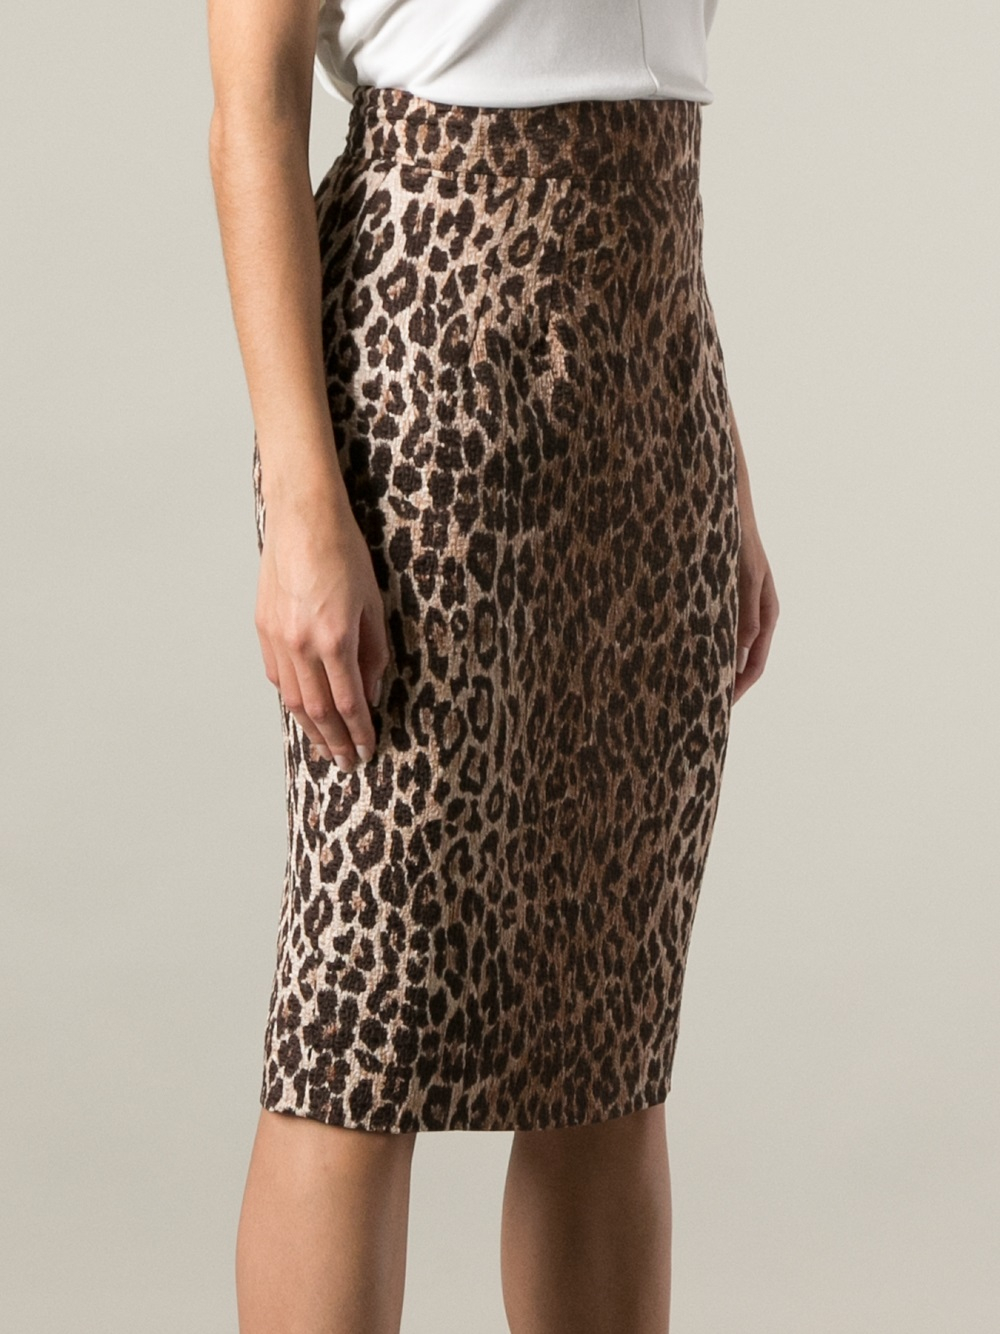 Dolce & gabbana Leopard Print Pencil Skirt | Lyst